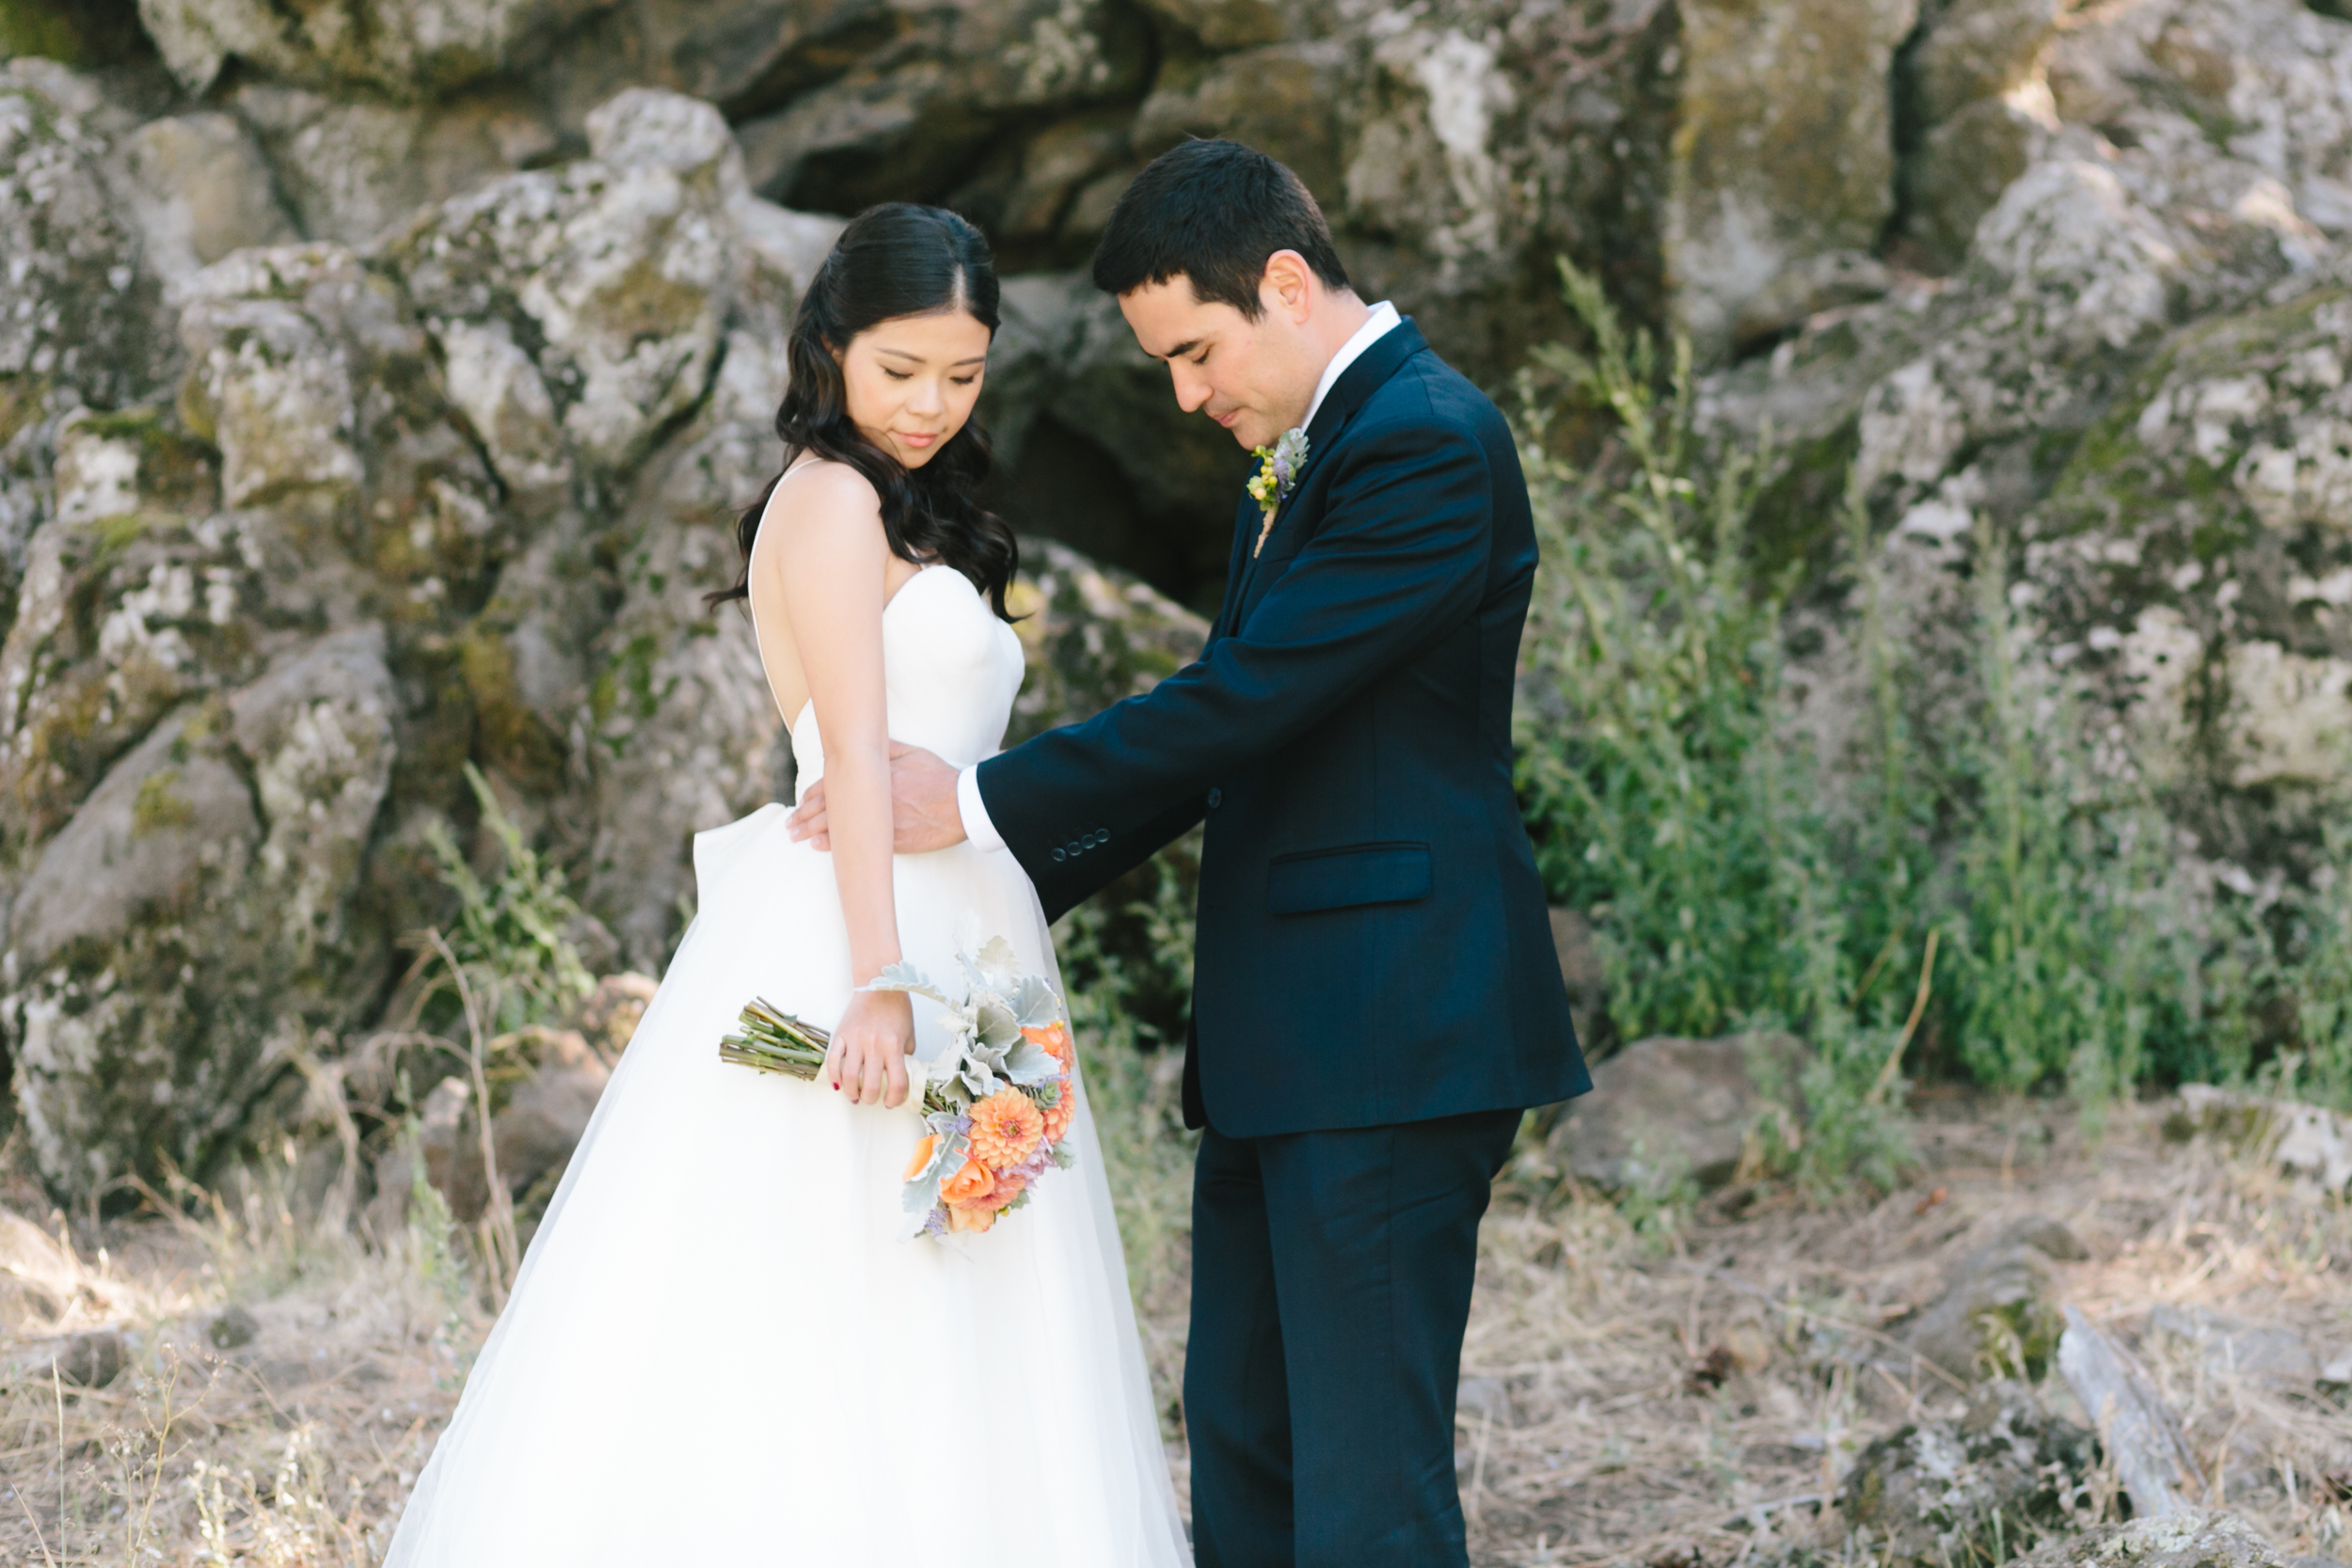 Alex and Ashley  Bend Oregon Wedding- Grace and Jaden Photography (123).jpg